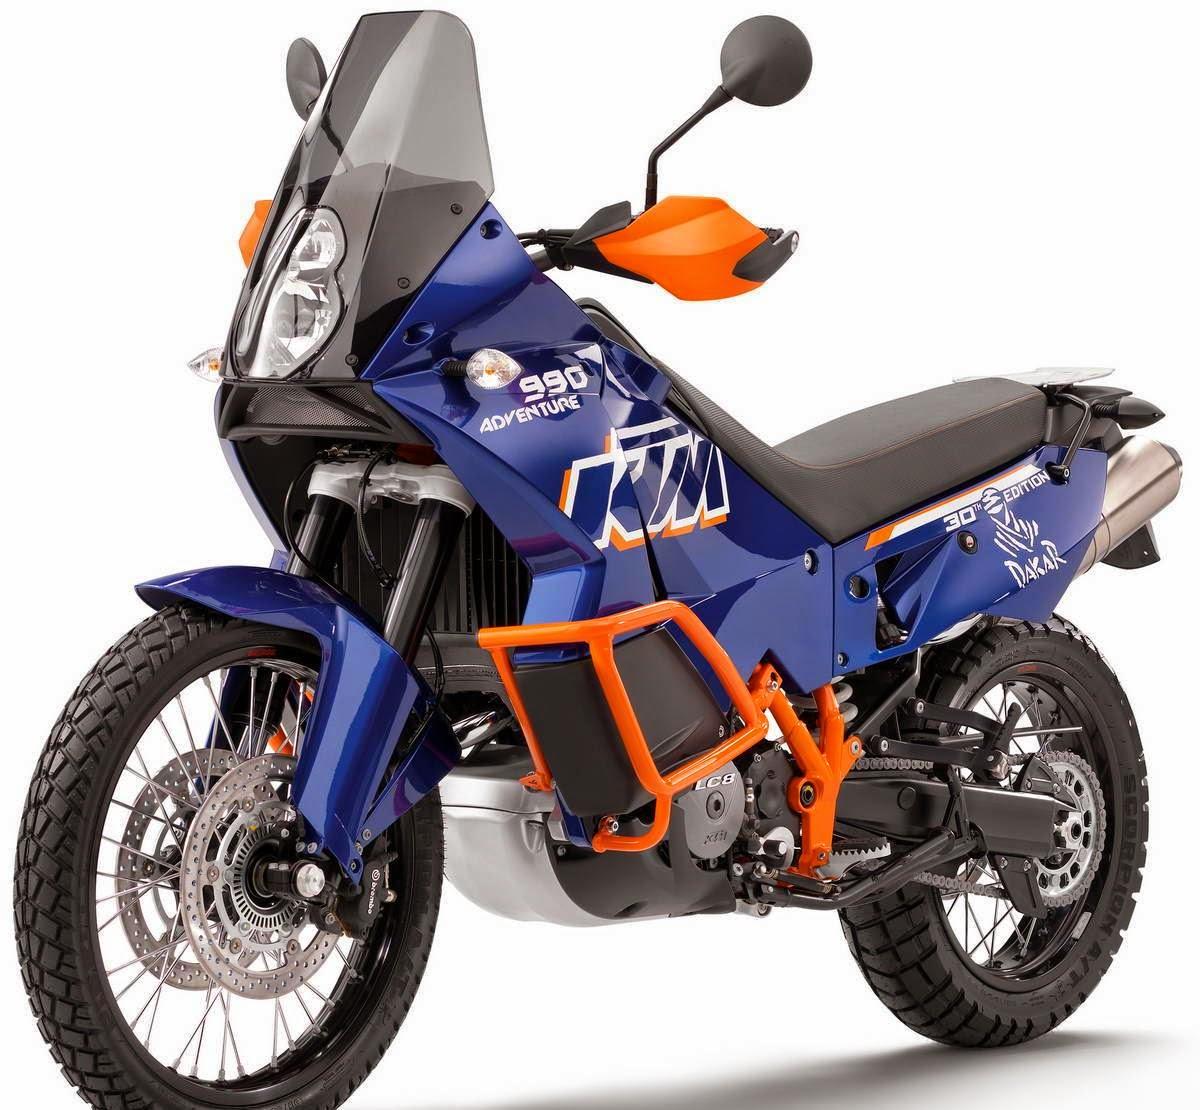 KTM 950 Adventure New Blue Bikes HD Wallpapers